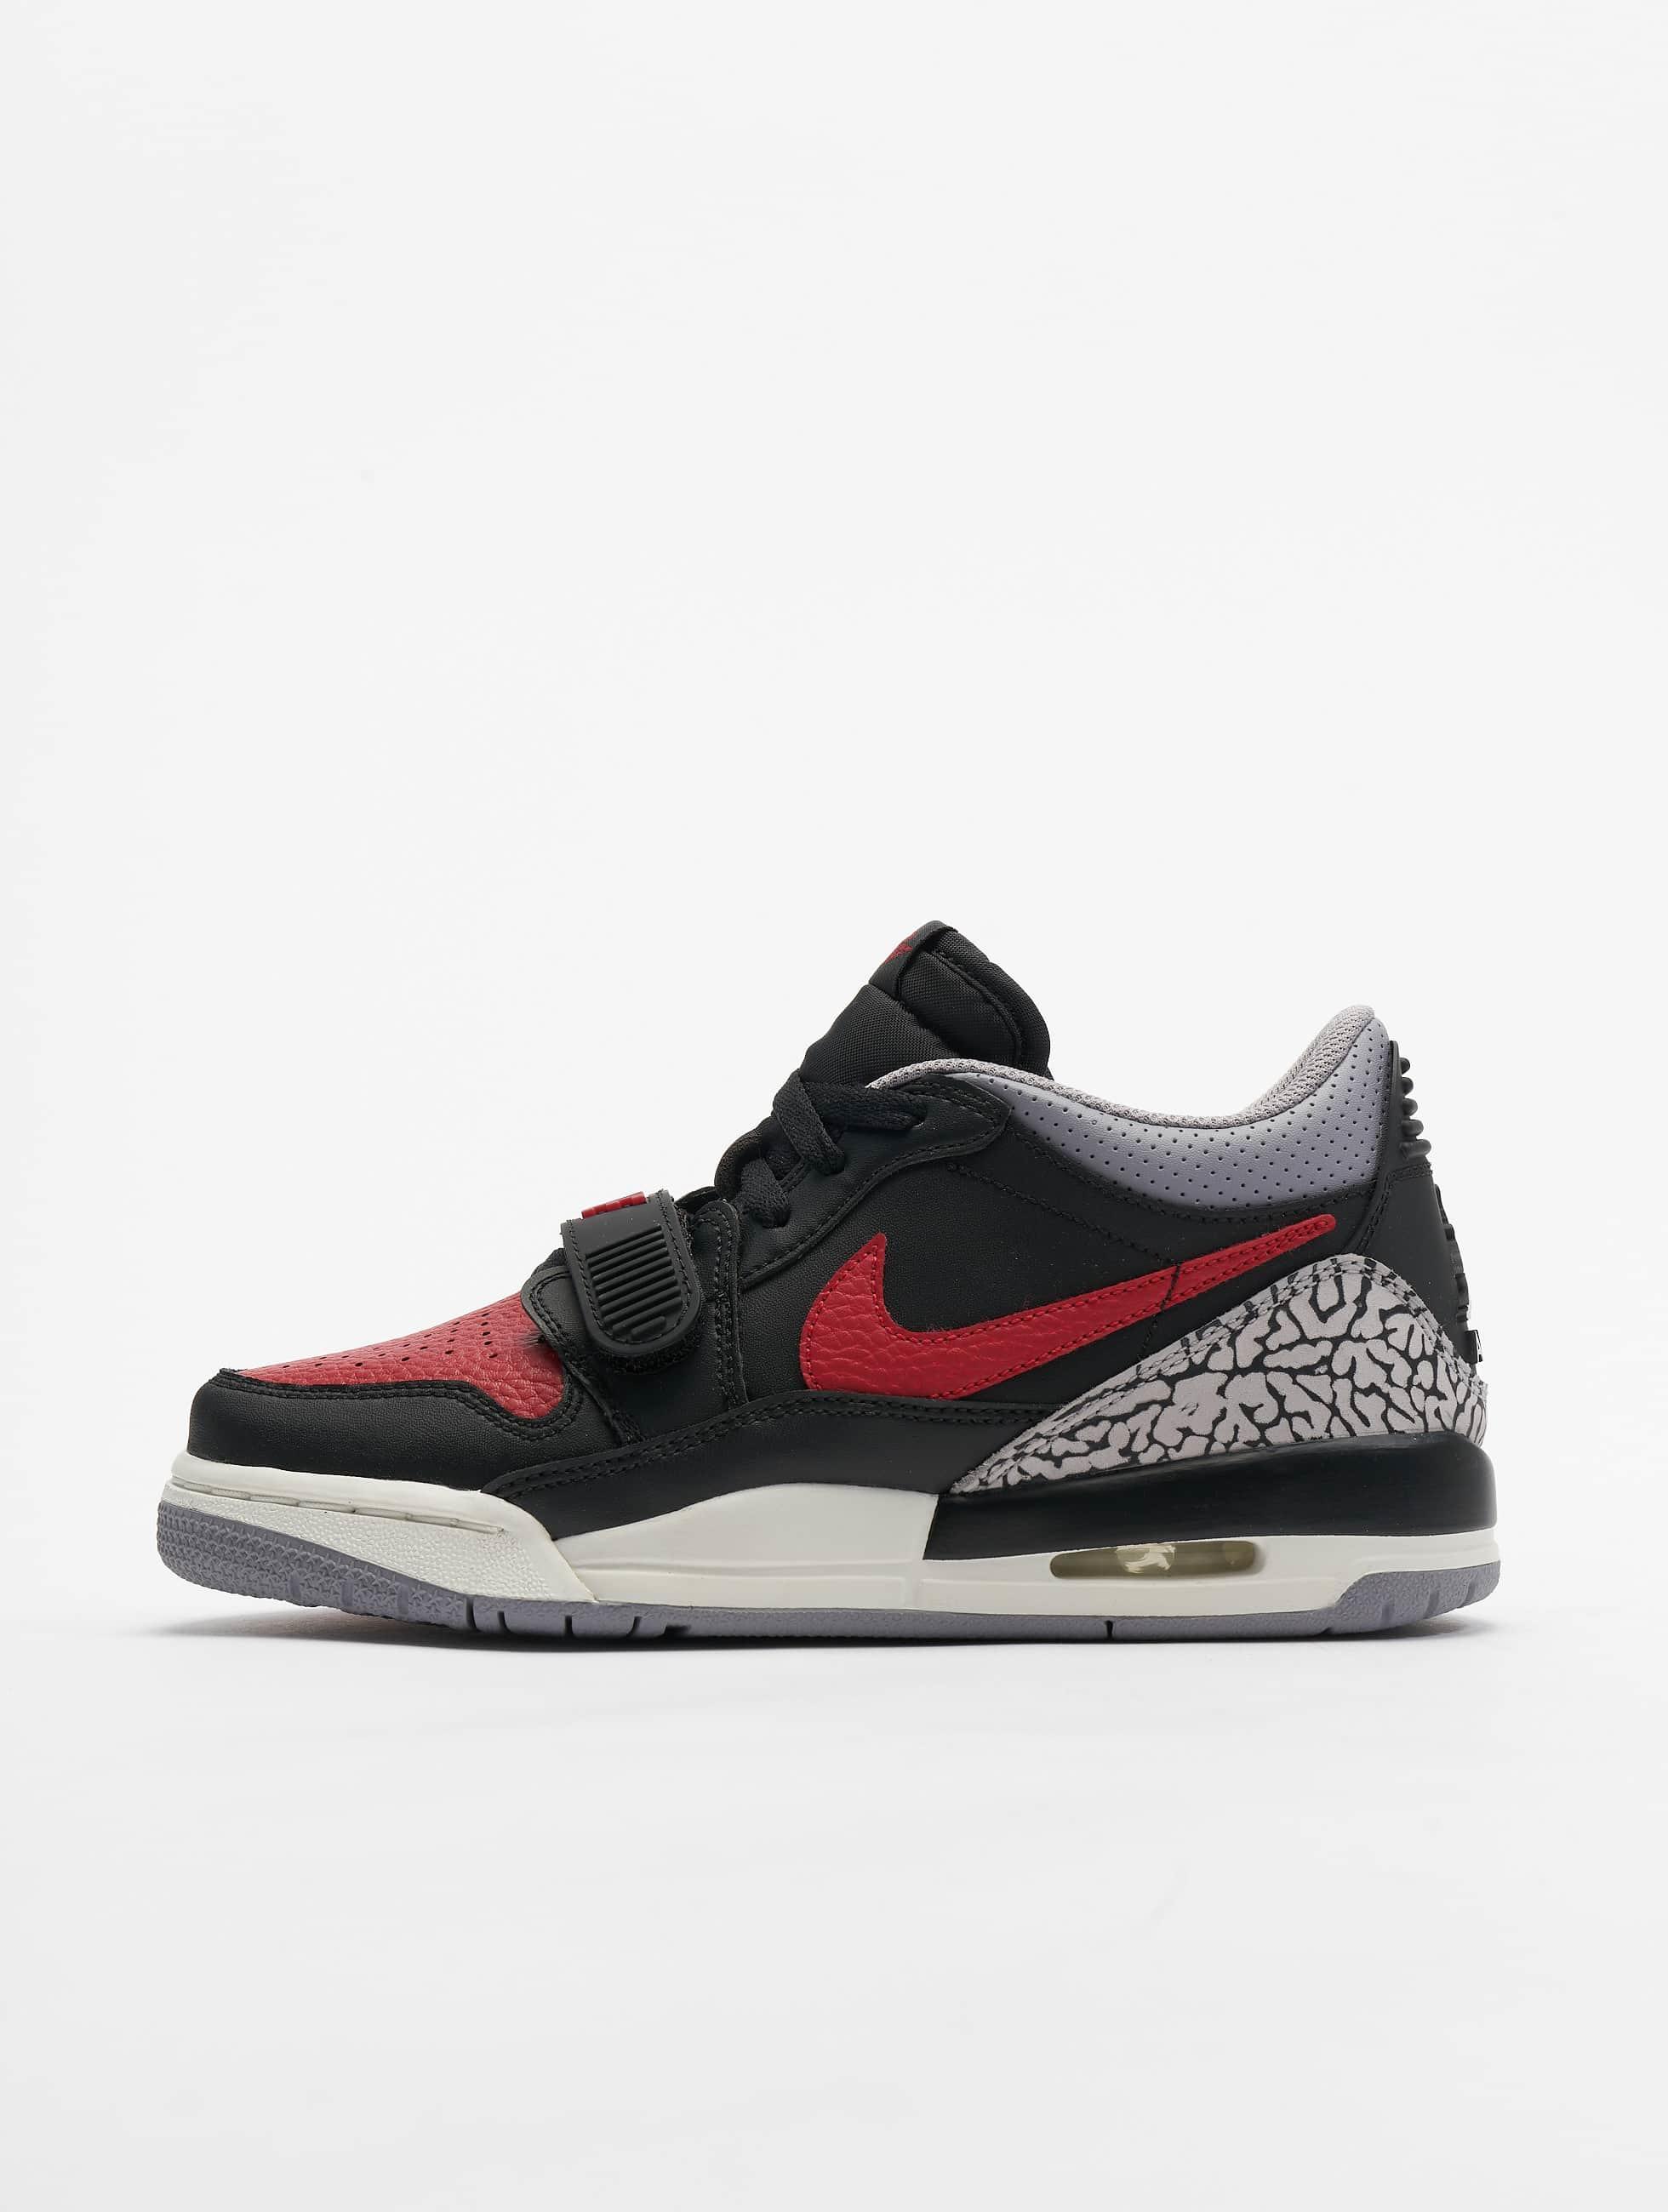 new concept bab69 4d599 Jordan schoen / sneaker Air Jordan Legacy 312 Low (GS) in zwart 661715